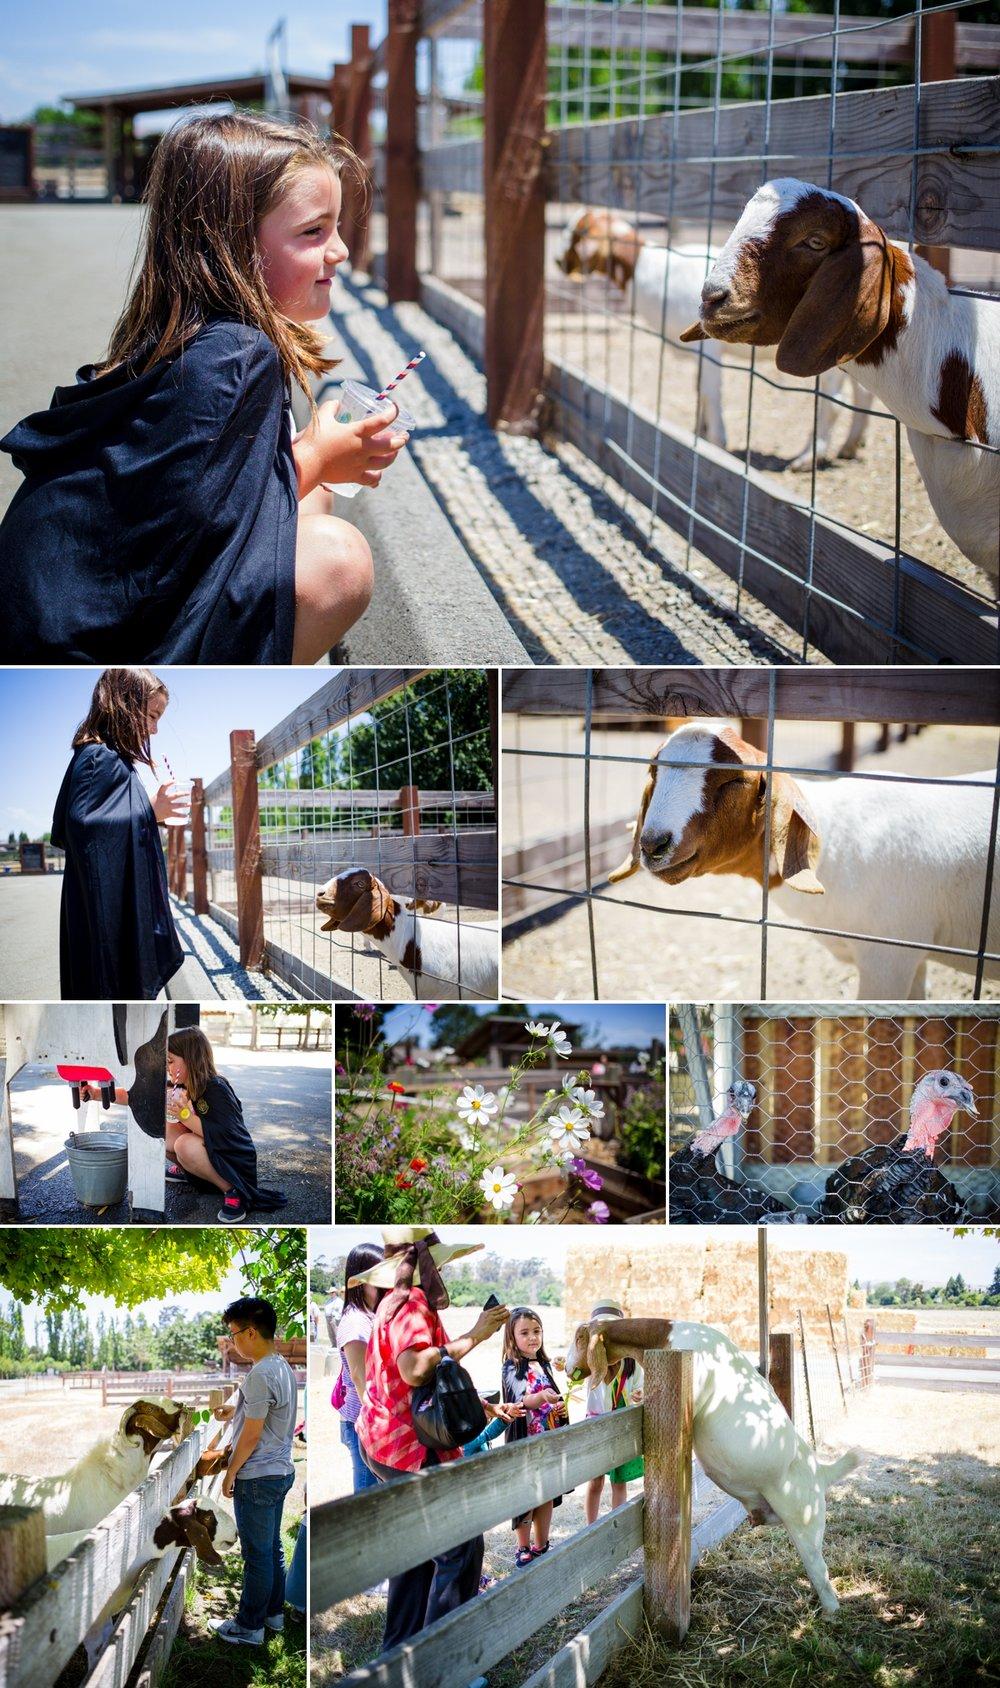 ardenwood farm goats